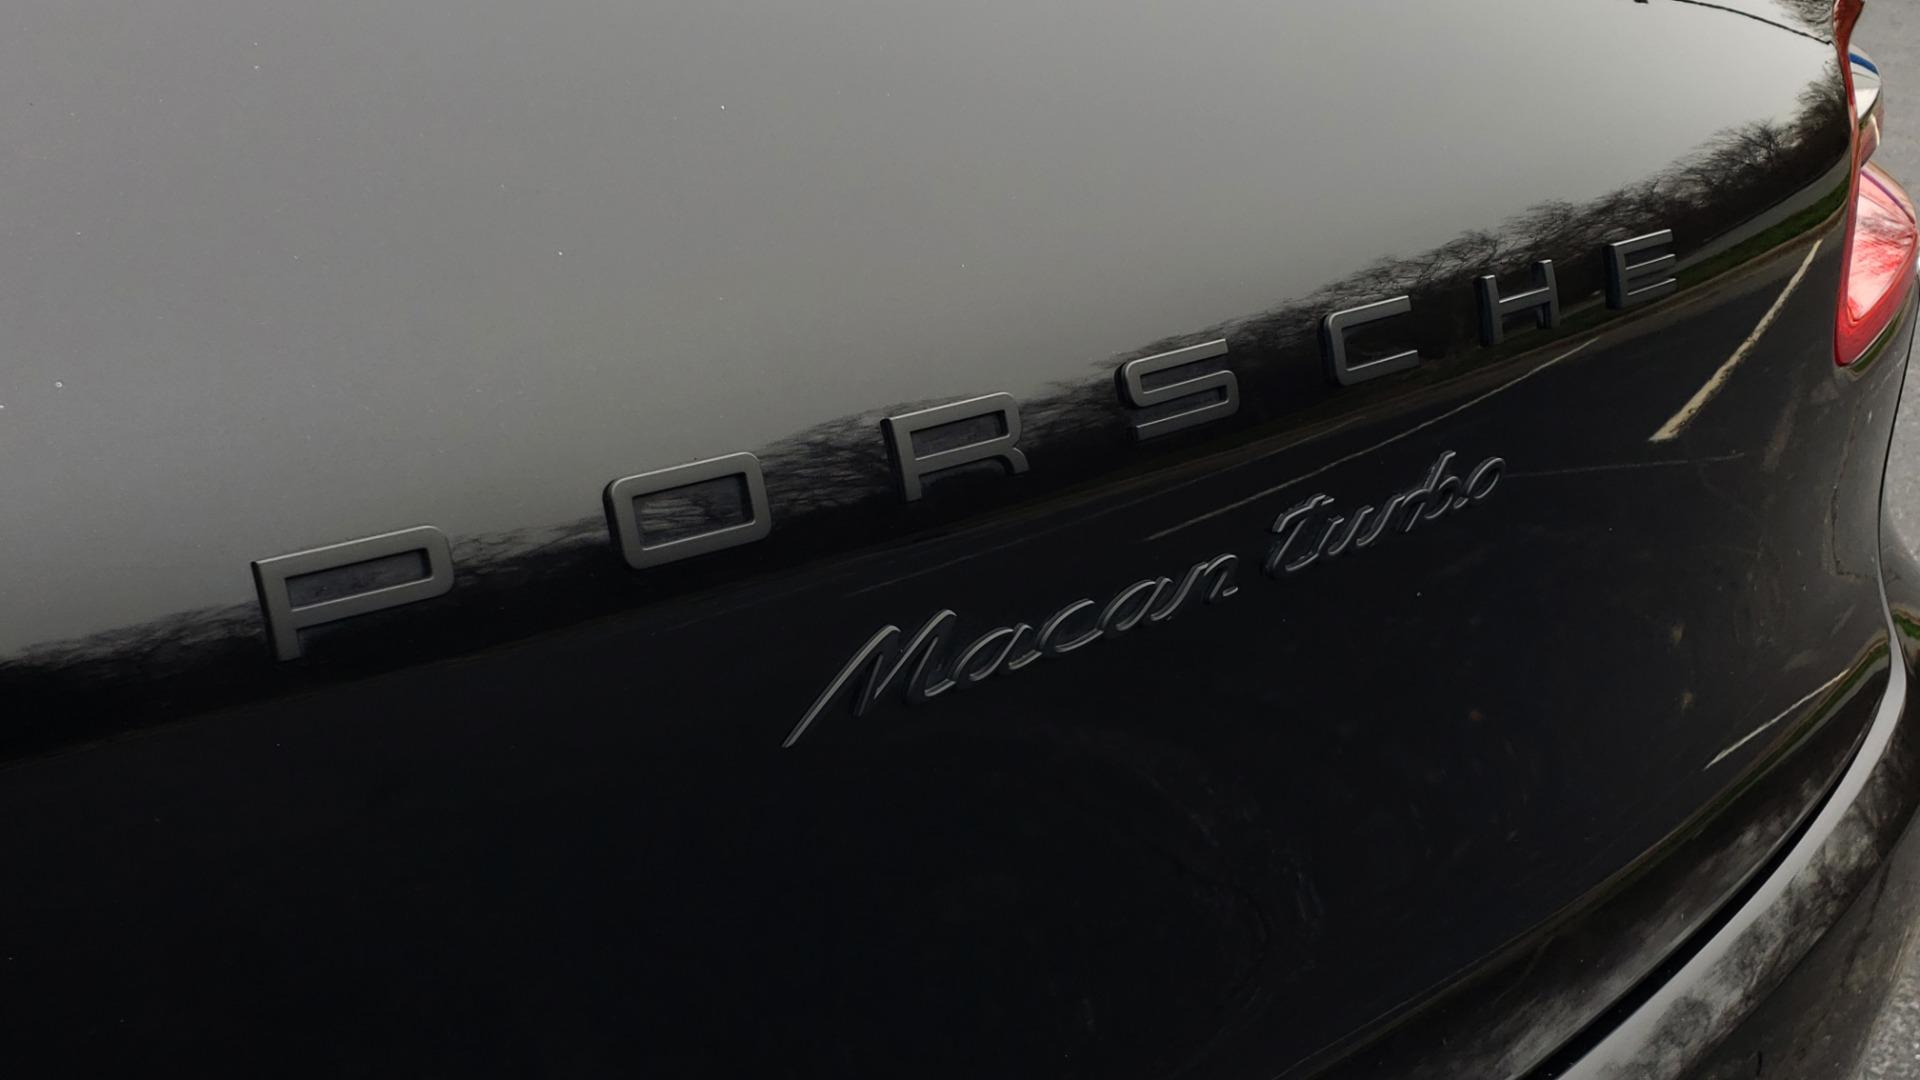 Used 2016 Porsche MACAN TURBO / PREM / NAV / PARK ASST / BOSE / PDK / CHRONO PKG for sale Sold at Formula Imports in Charlotte NC 28227 29